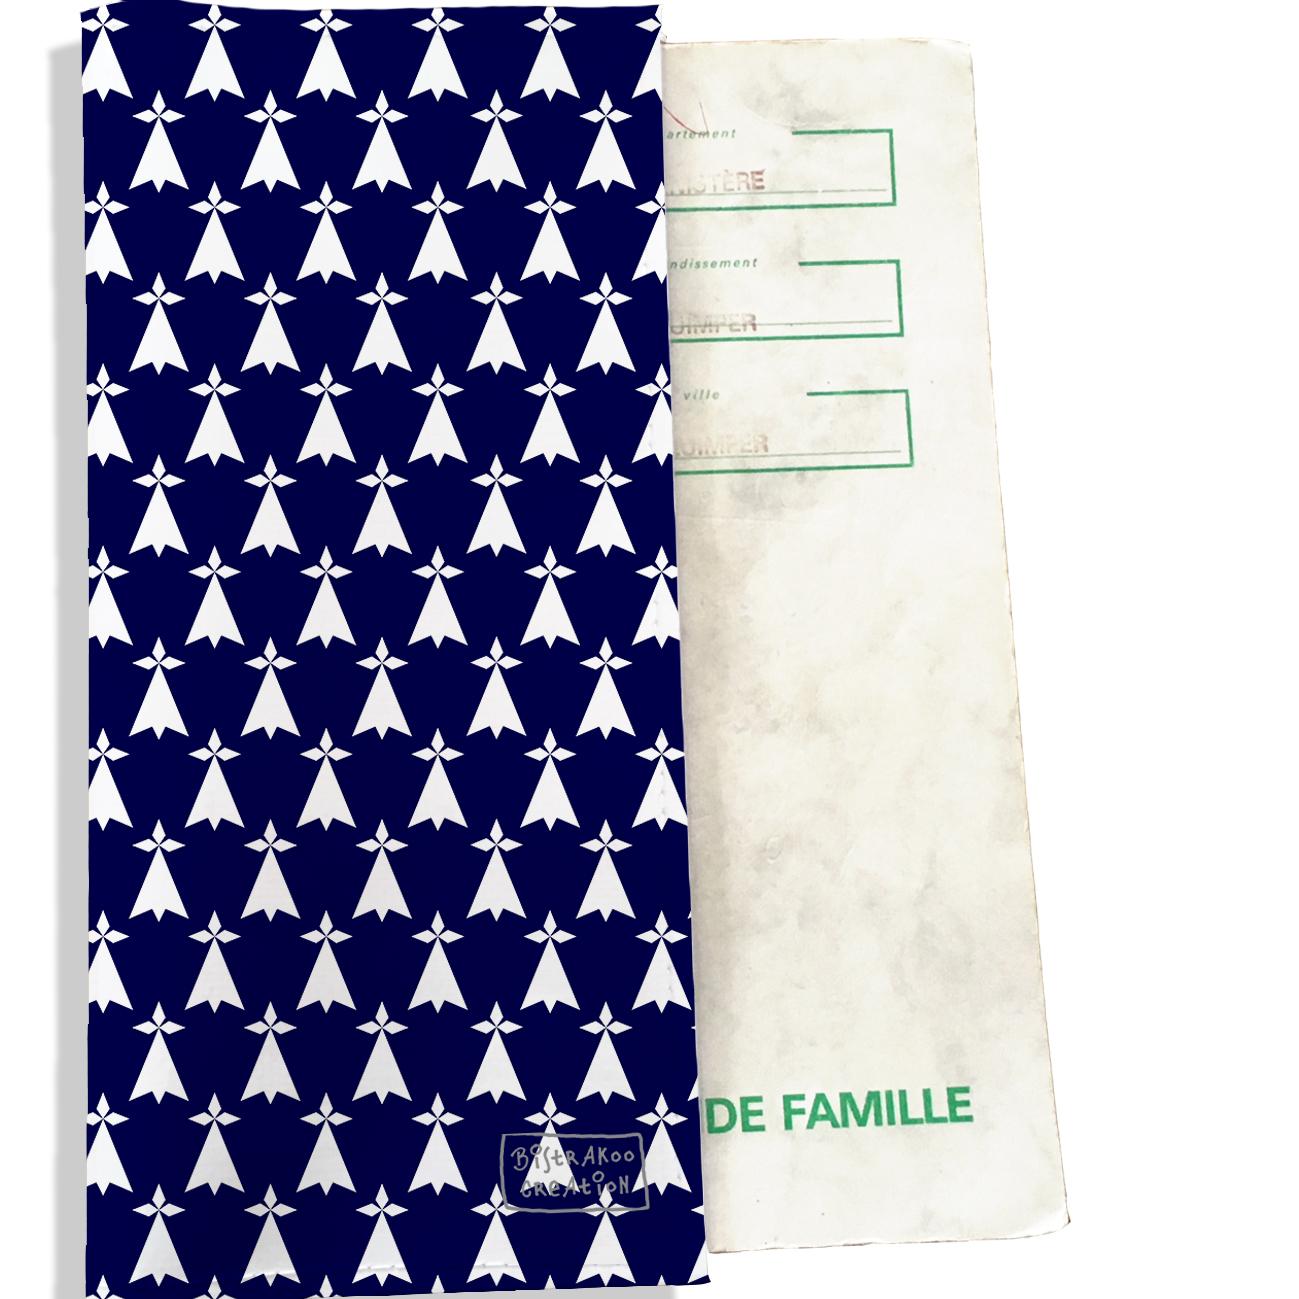 Protège livret de famille motif breton Bretagne BZH Gwen Ha Du Hermines blanches fond bleu marine L8011